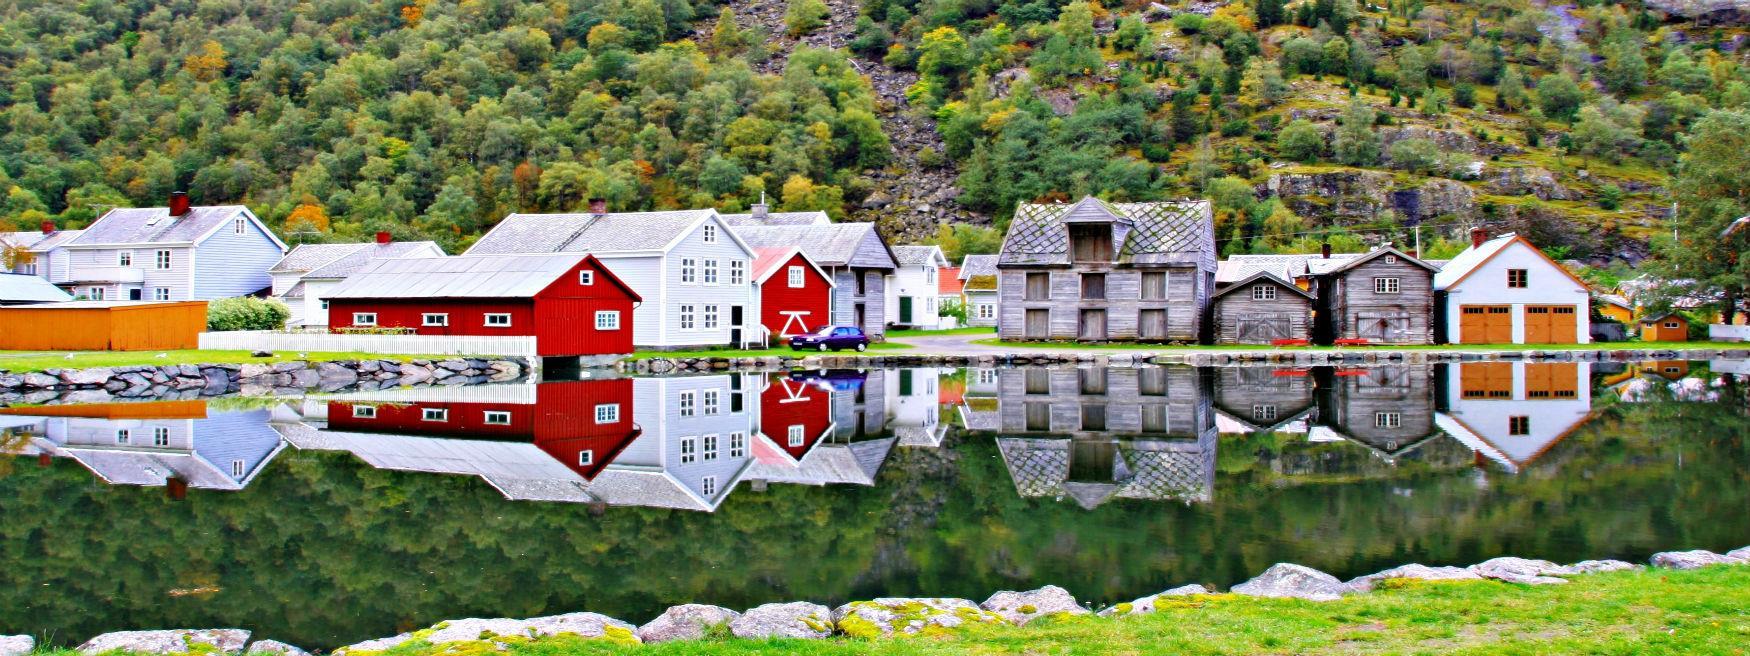 Lærdal © Magnhild Aspevik